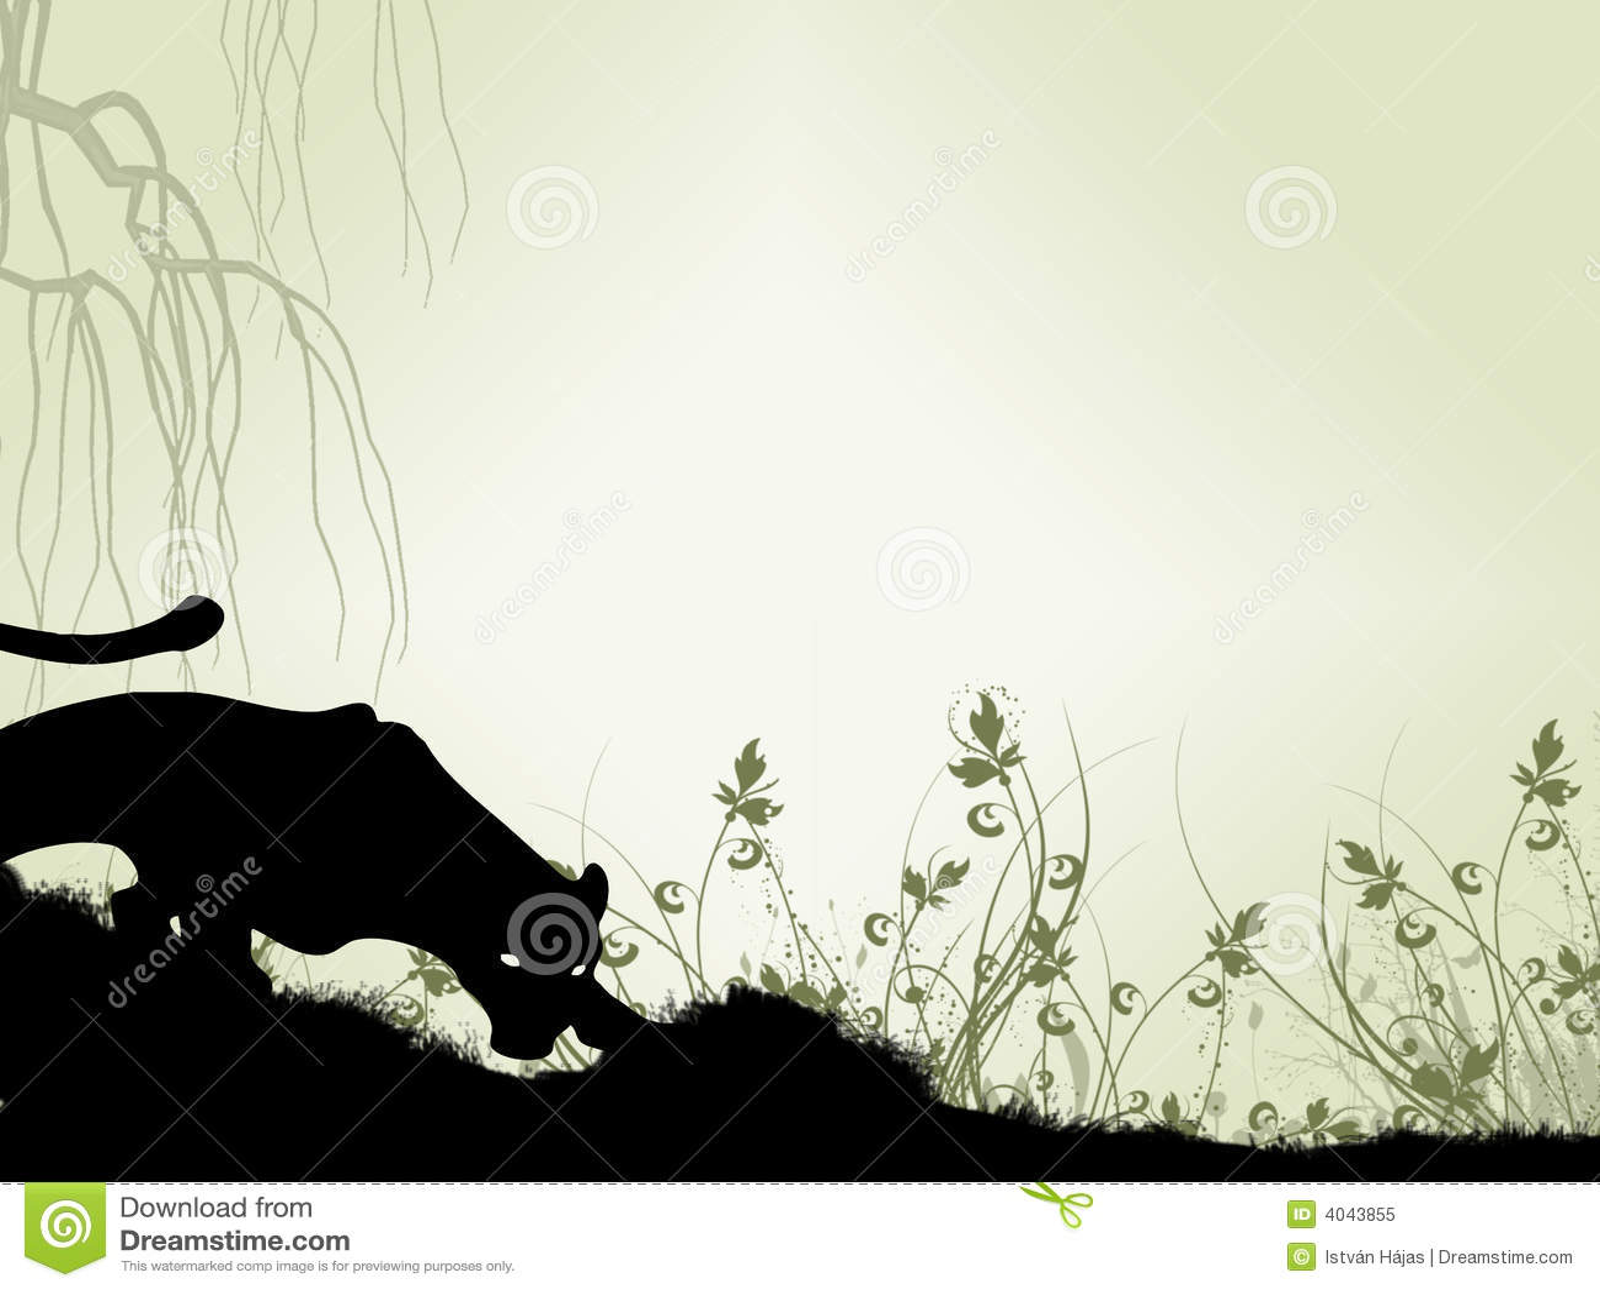 puma background